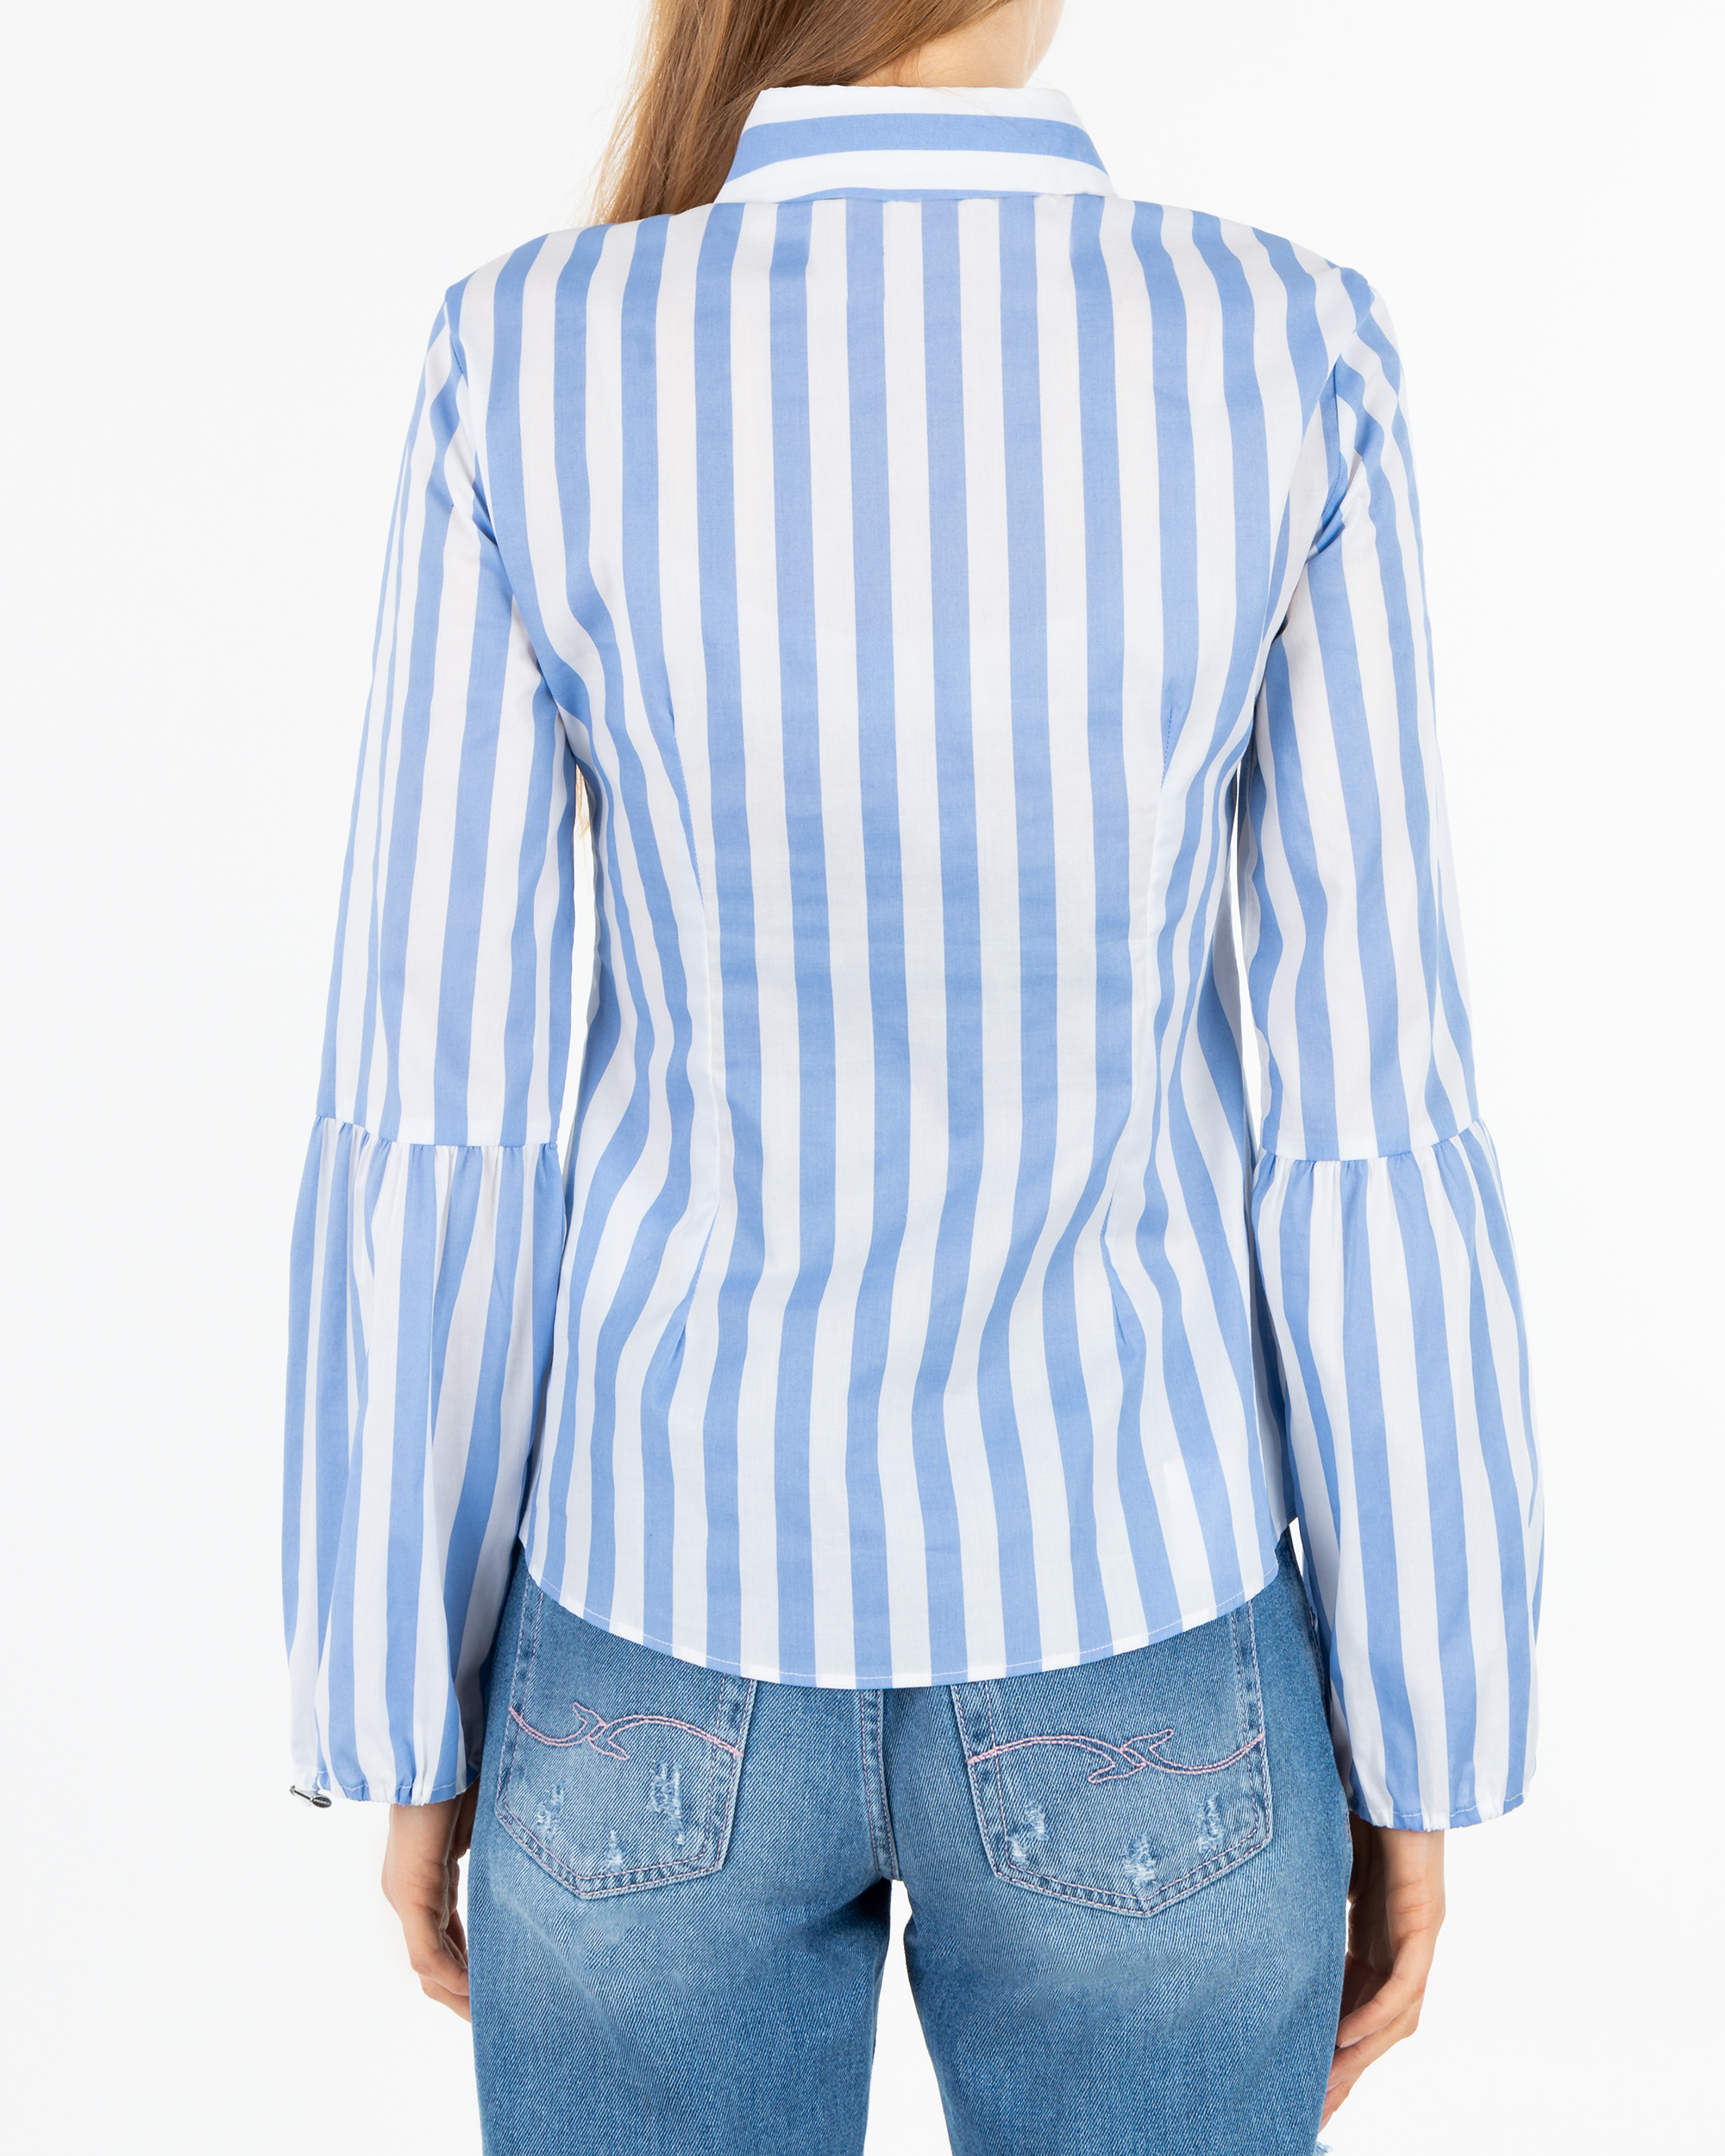 54bb8d3173 Koszula Trussardi Jeans 56C00189 1T002304 U120 niebieski - Royal Collection  - Odziez damska i męska